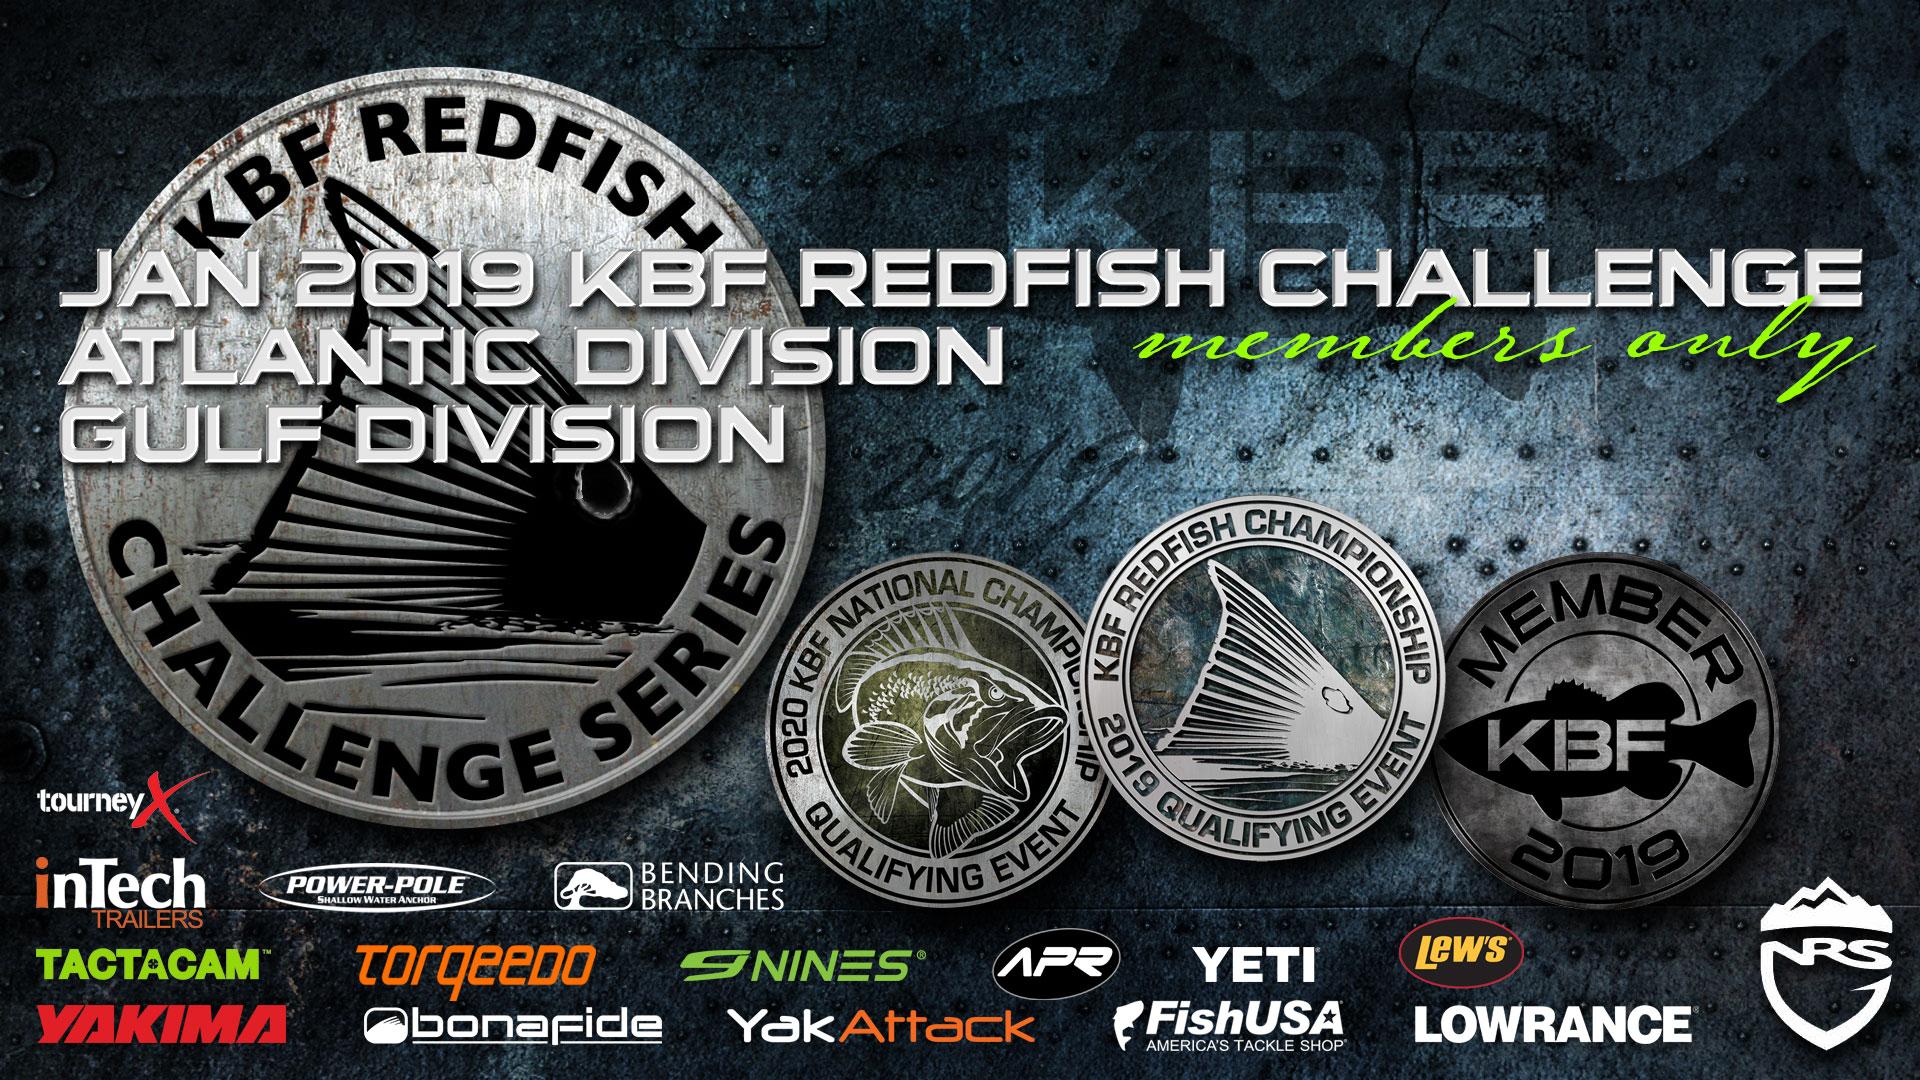 Jan 2019 KBF Redfish Challenge